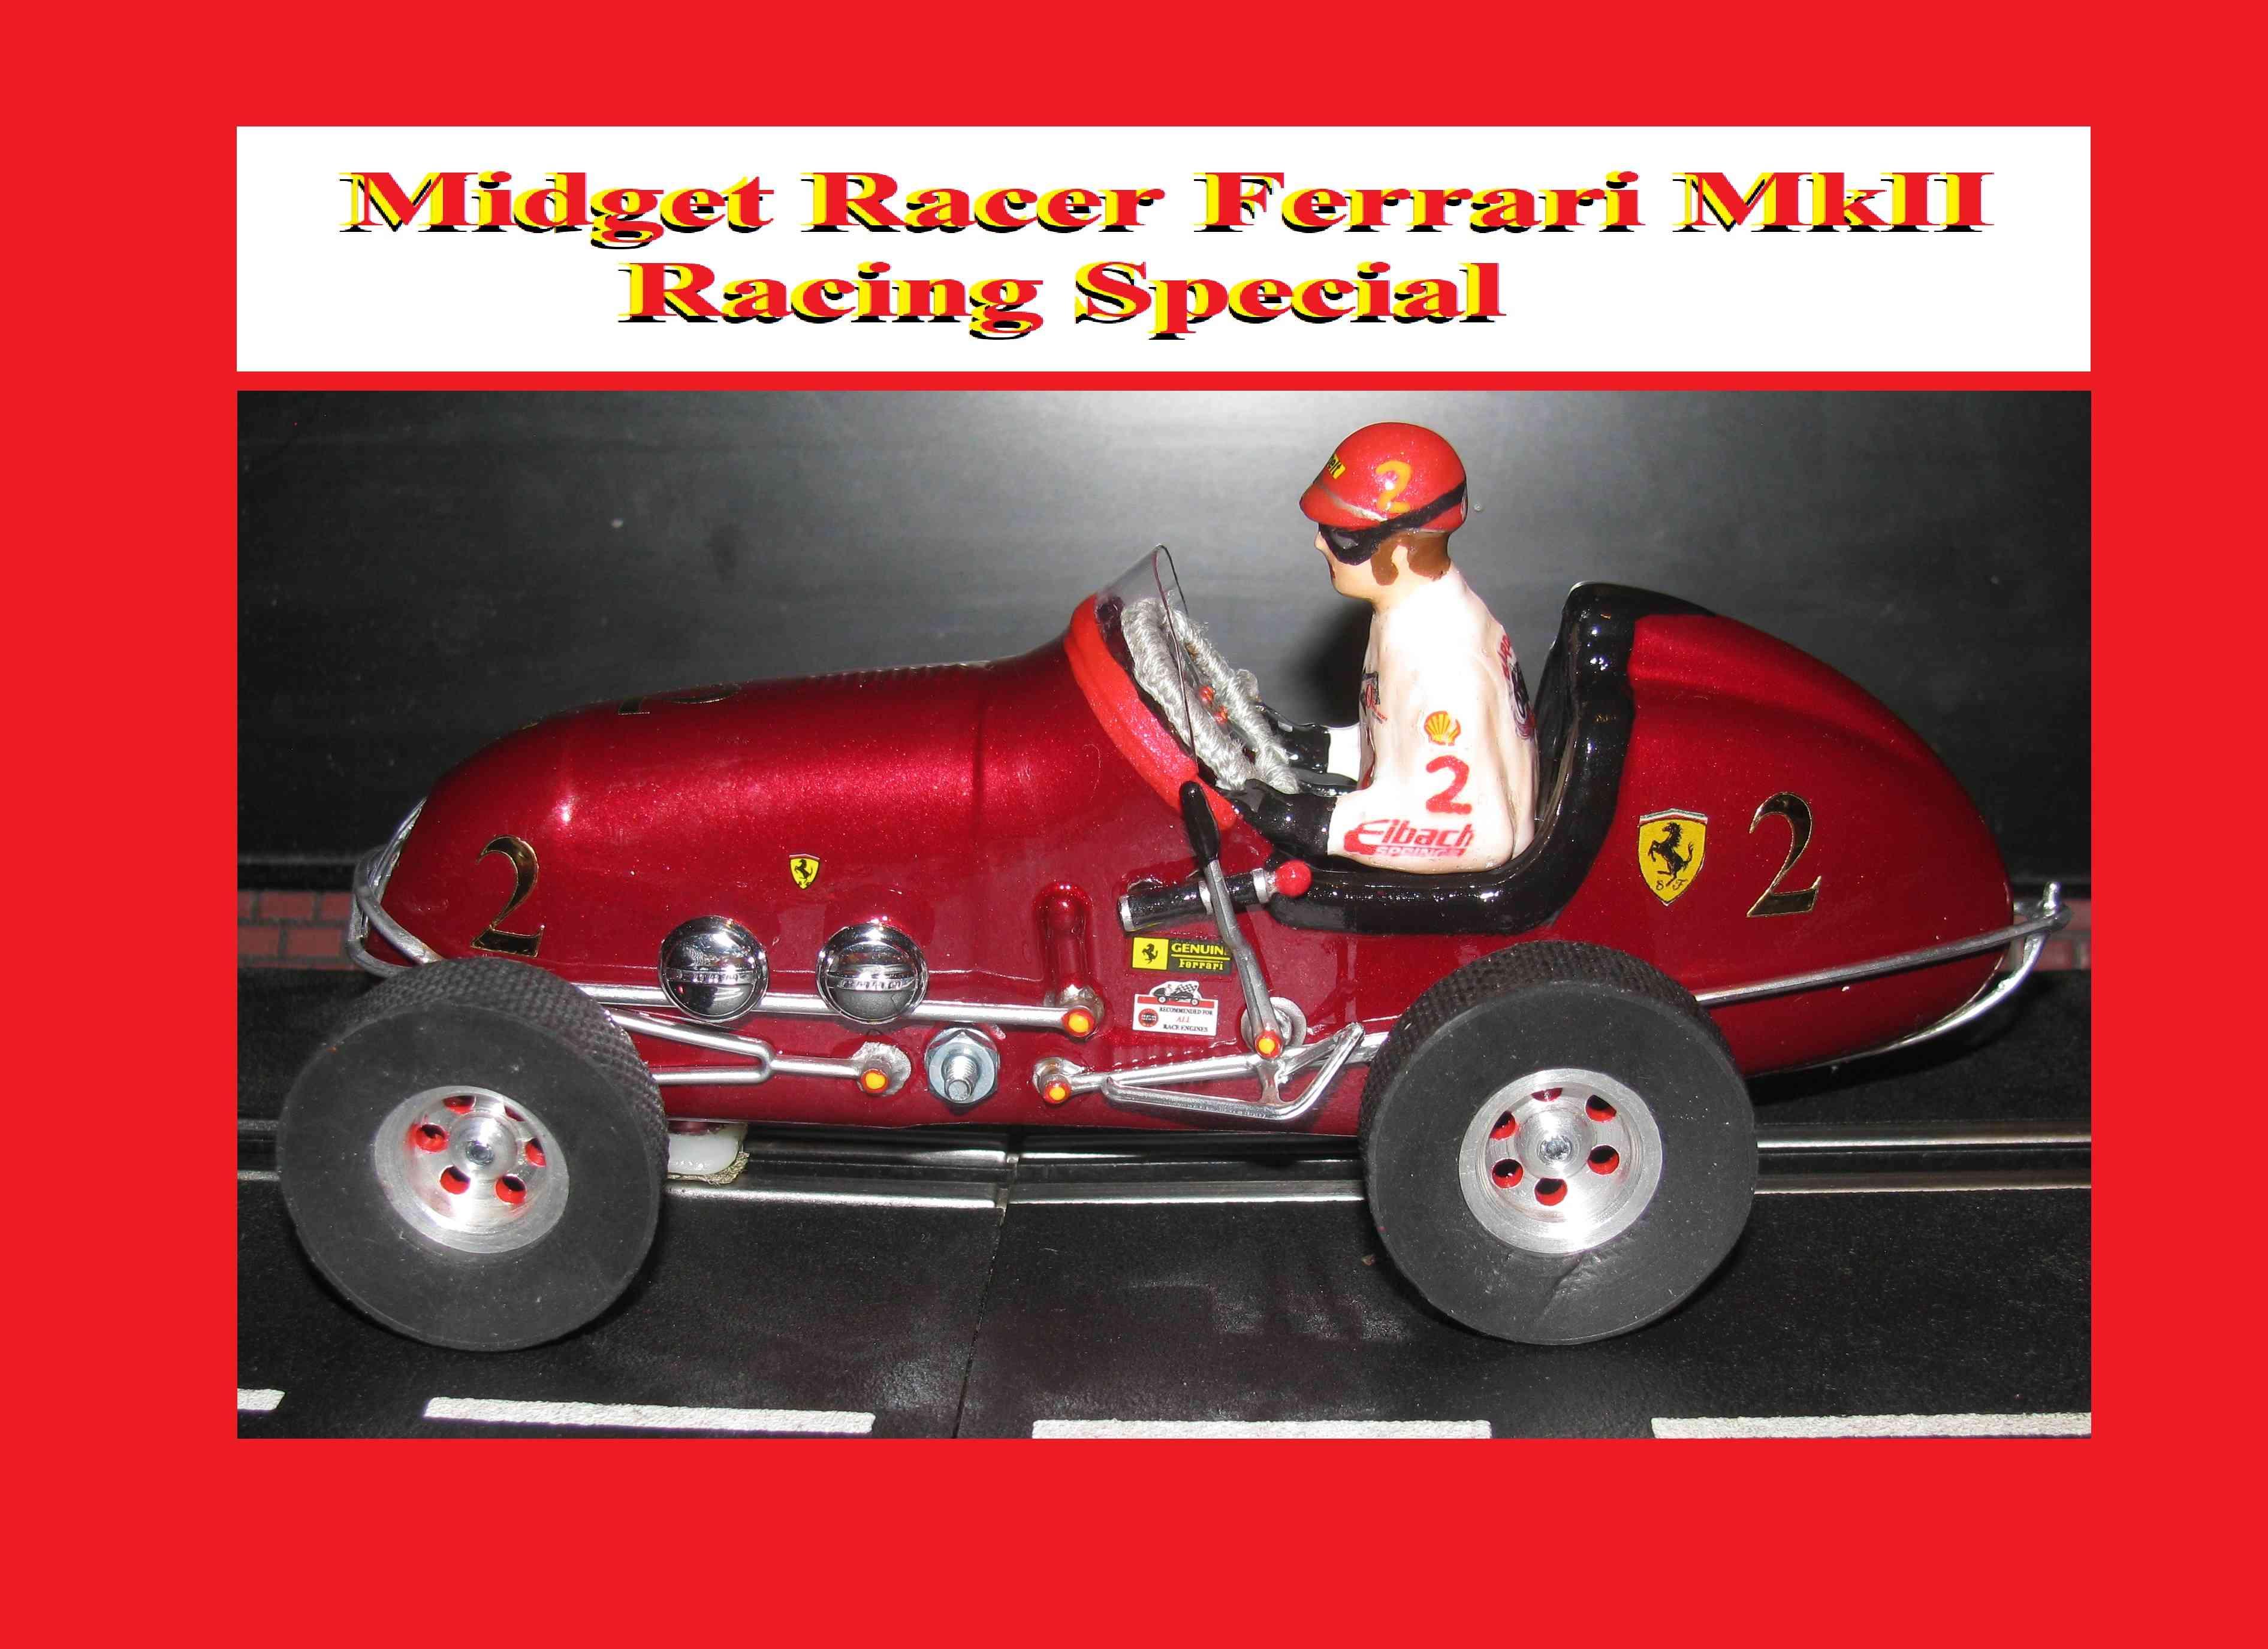 SALE - Monogram Midget Racer Ferrari MkII Racing Special Slot Car 1/24 Scale (Firemist Red Inferno Metallic)